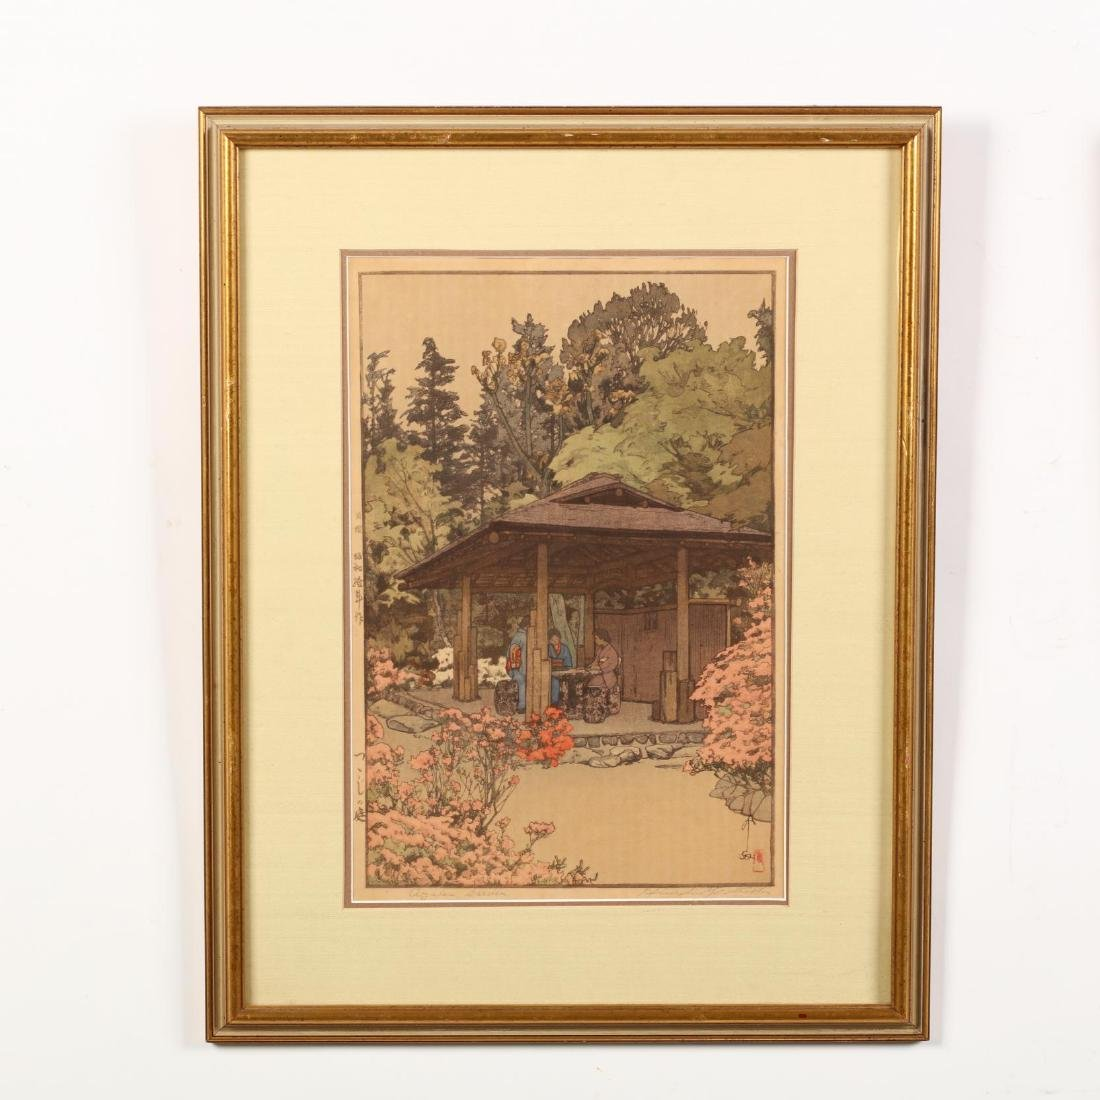 Three Japanese Woodblock Prints by Hiroshi Yoshida - 5